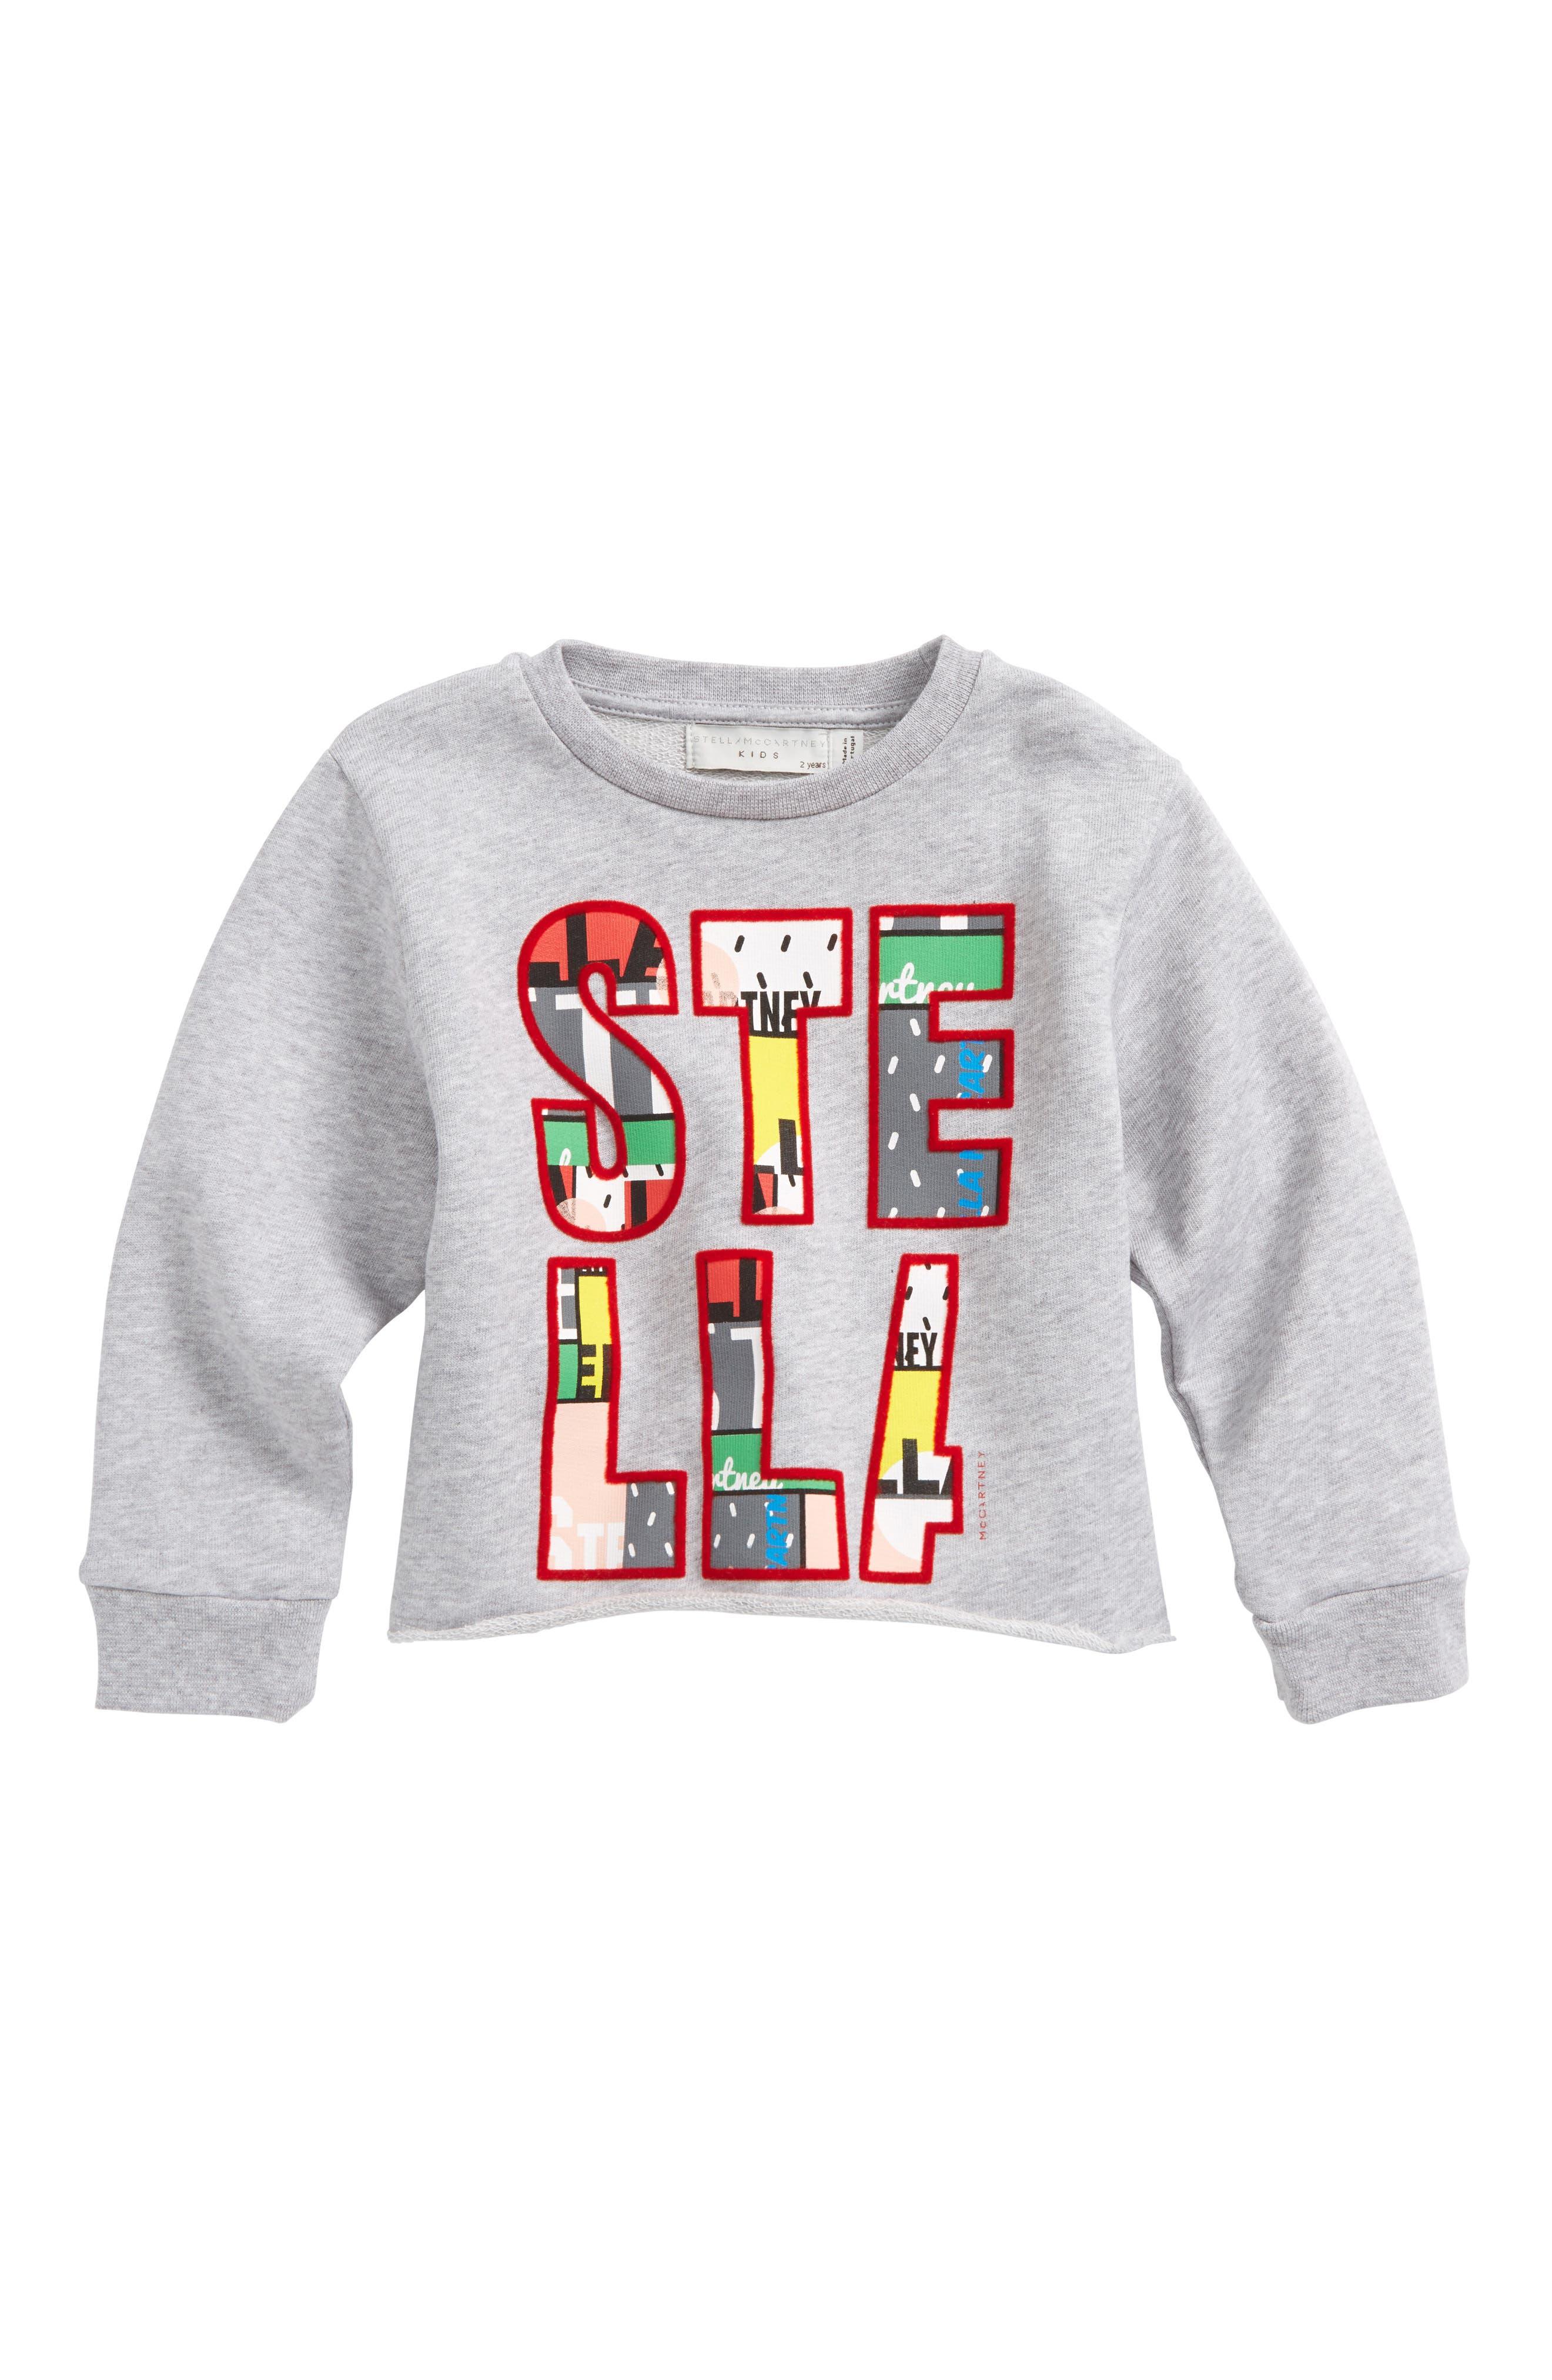 STELLA MCCARTNEY,                             June Crop Sweatshirt,                             Main thumbnail 1, color,                             021